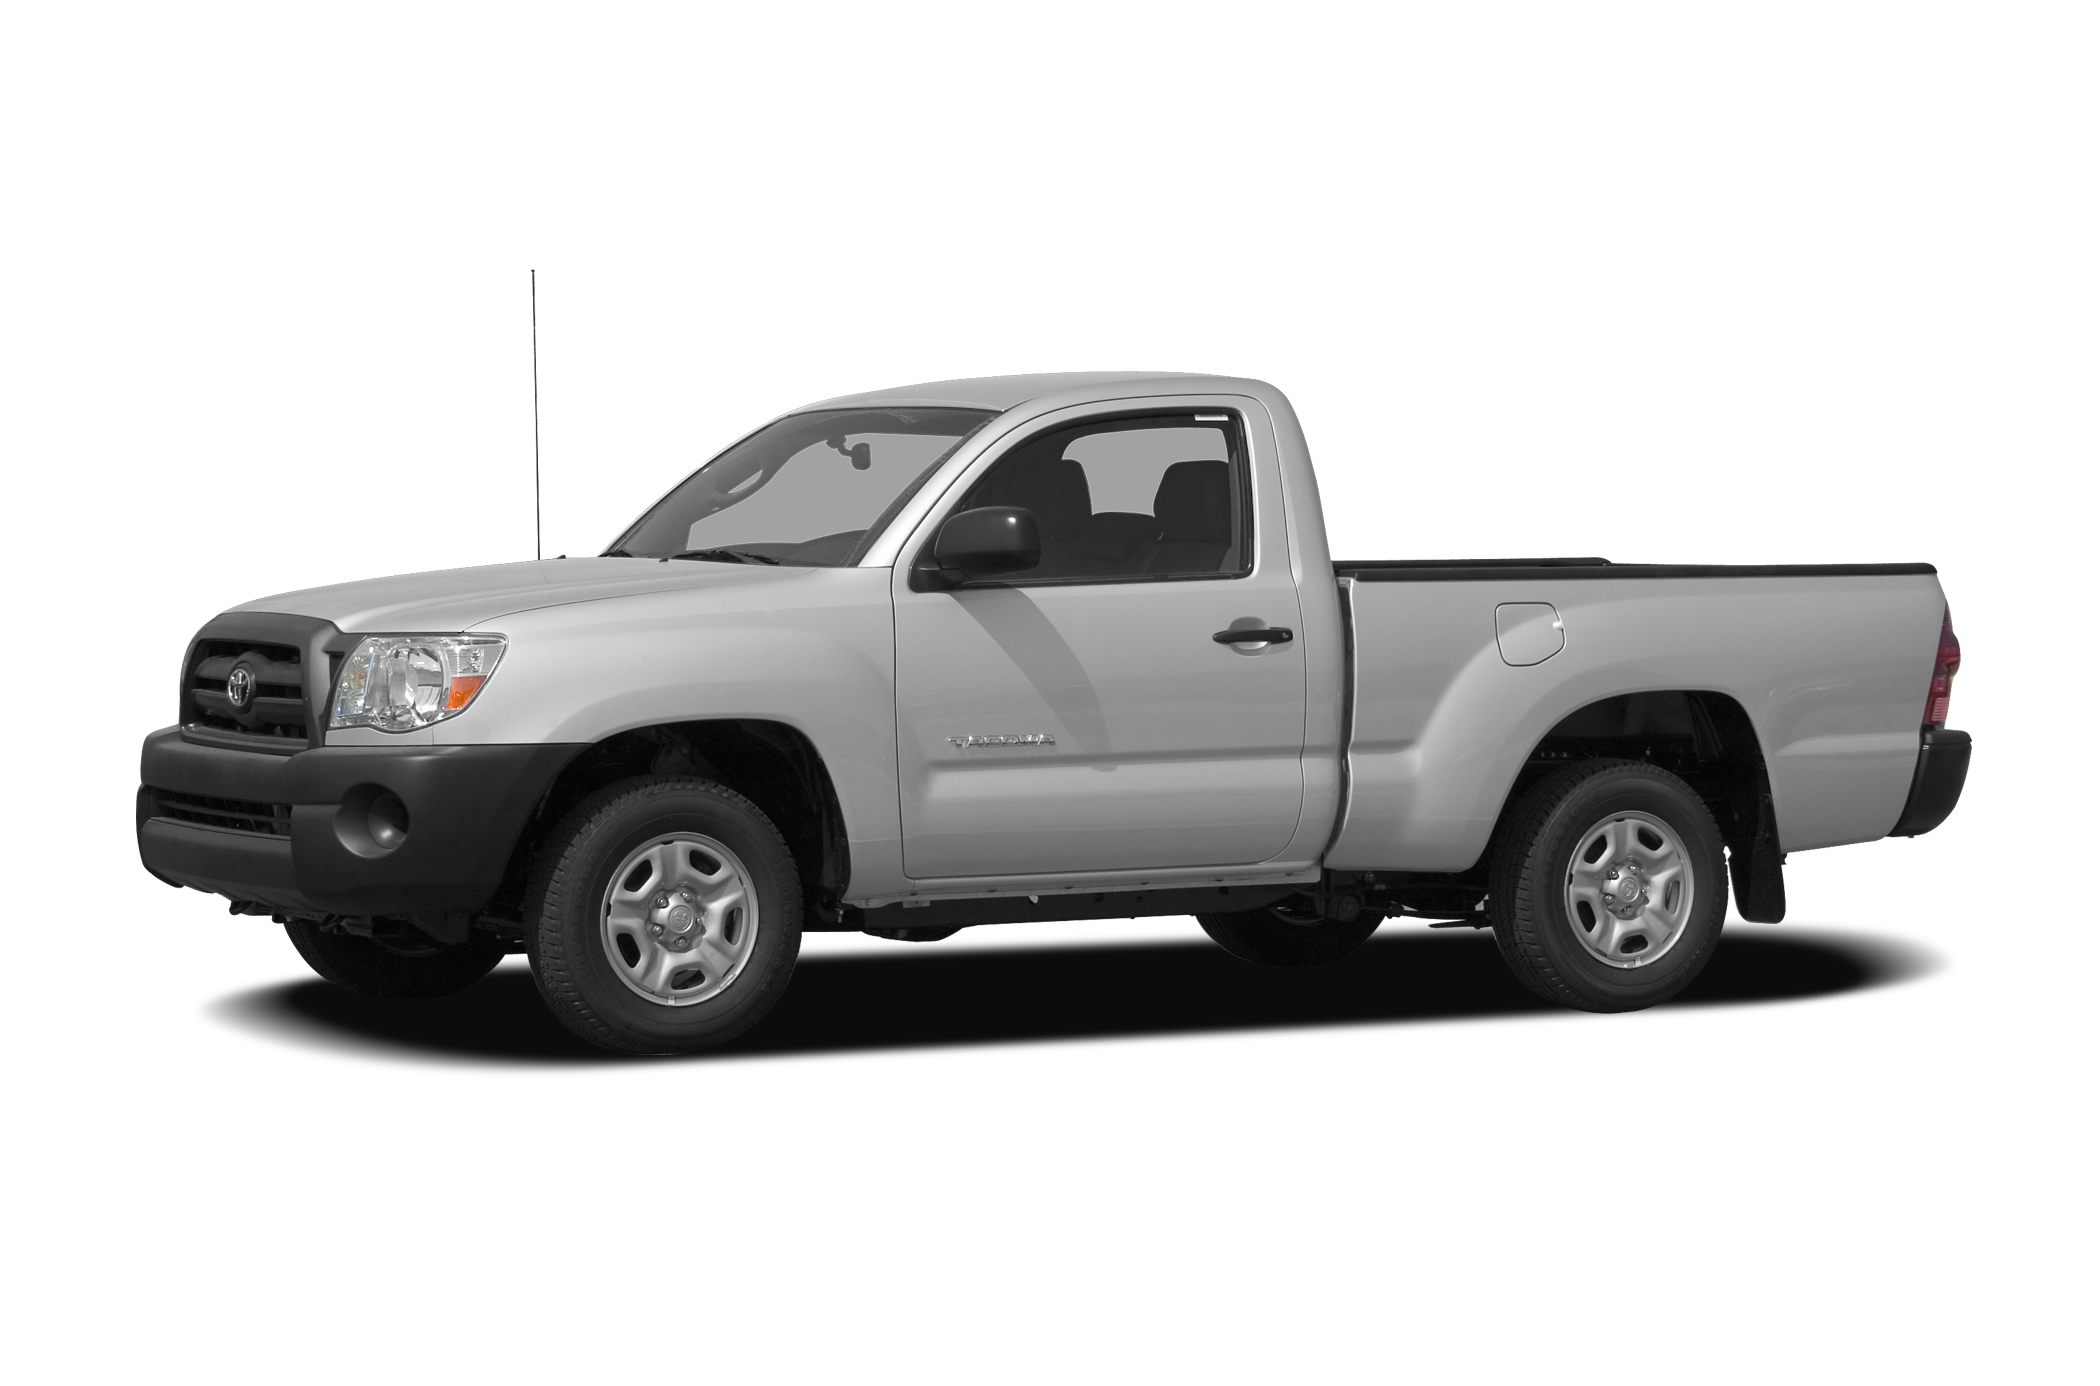 2008 Toyota Tacoma  Miles 67295Color White Stock P4083A VIN 5TENX22N48Z540839